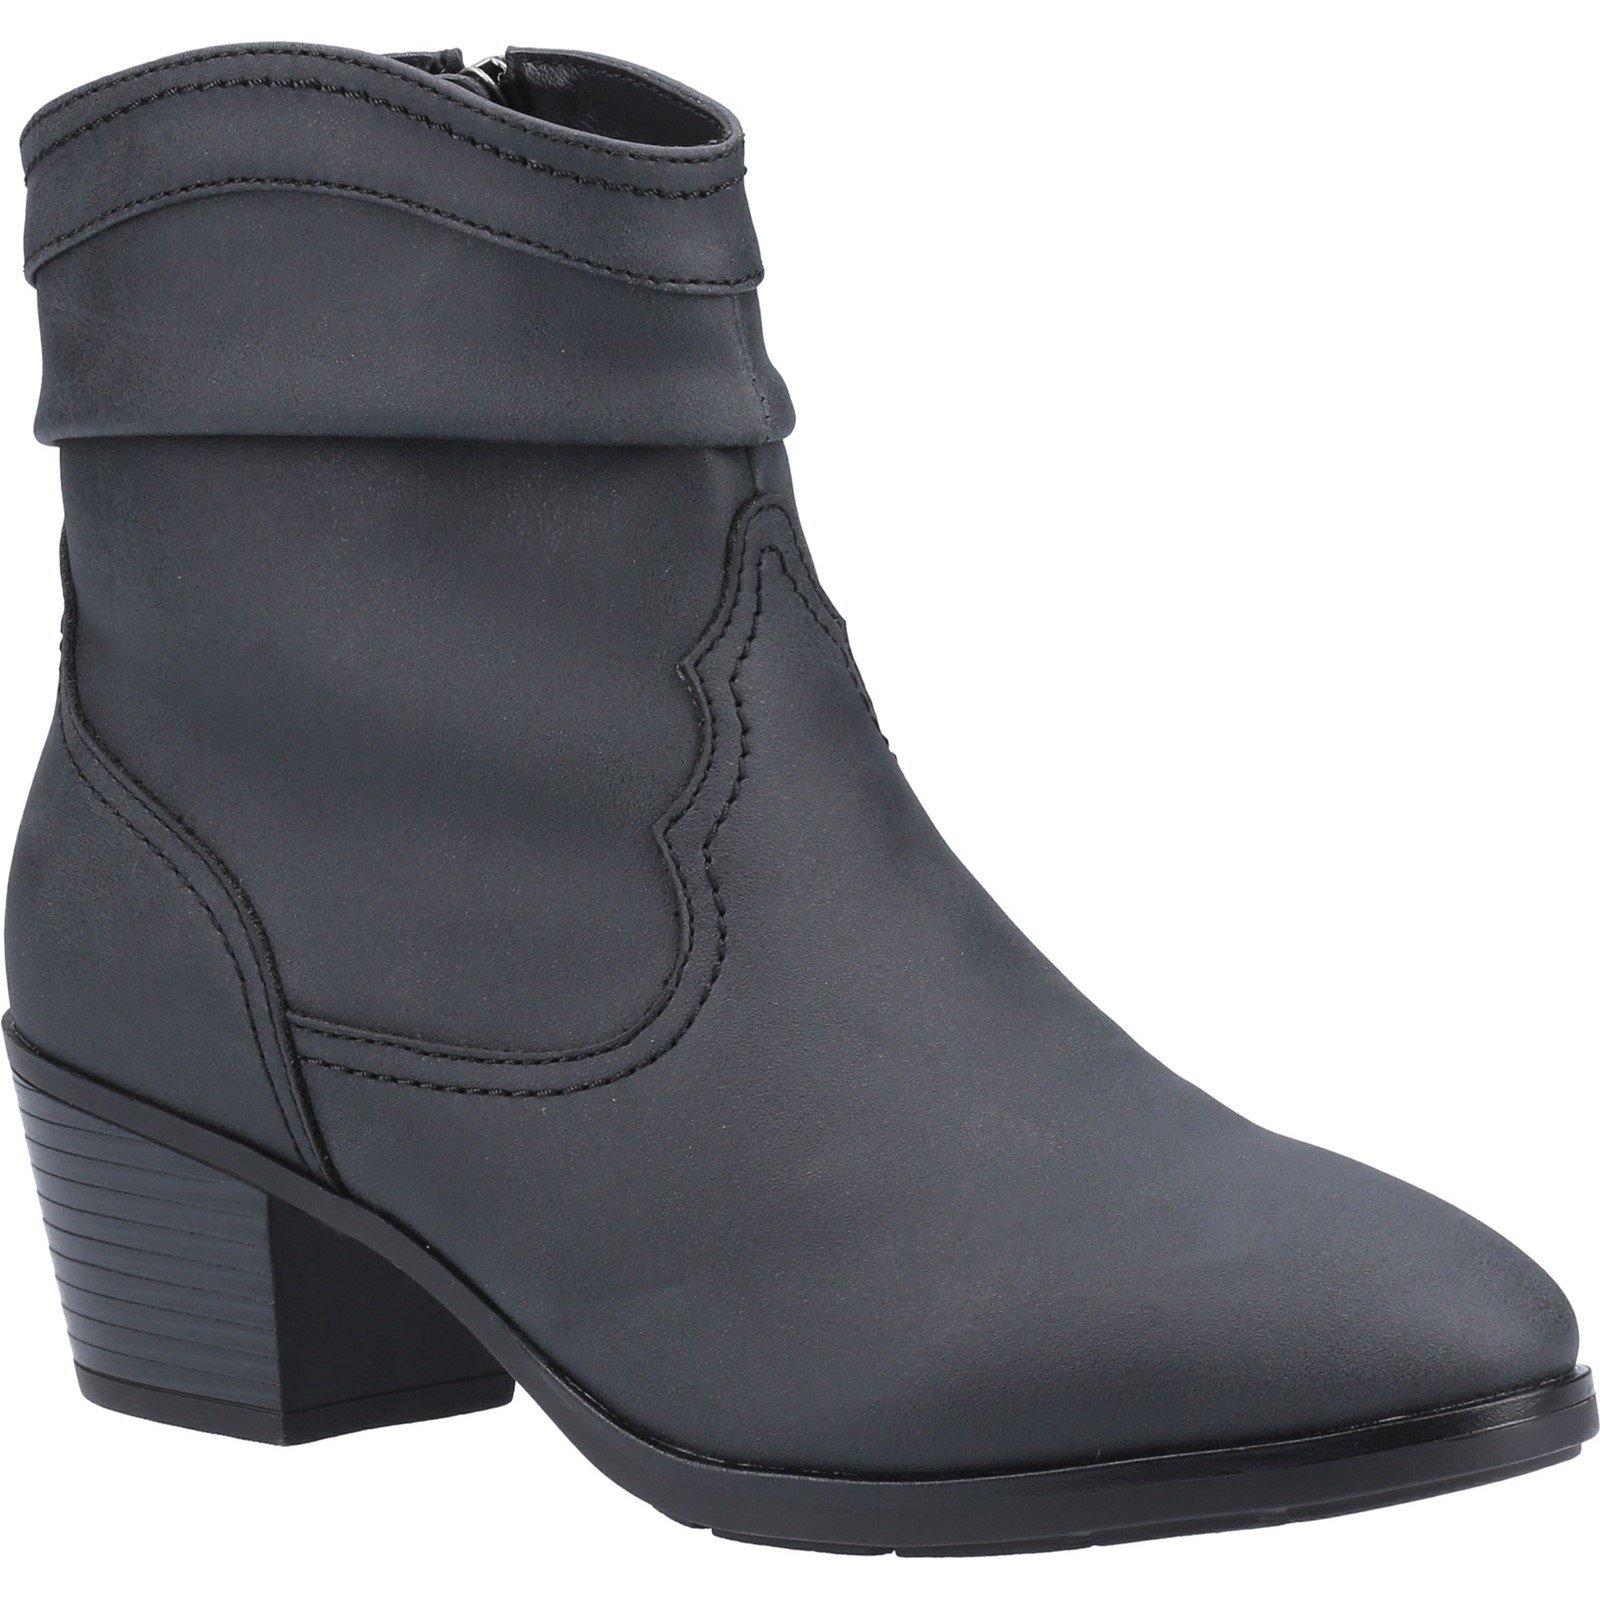 Divaz Women's Adele Ankle Boot Various Colours 33028 - Black 3